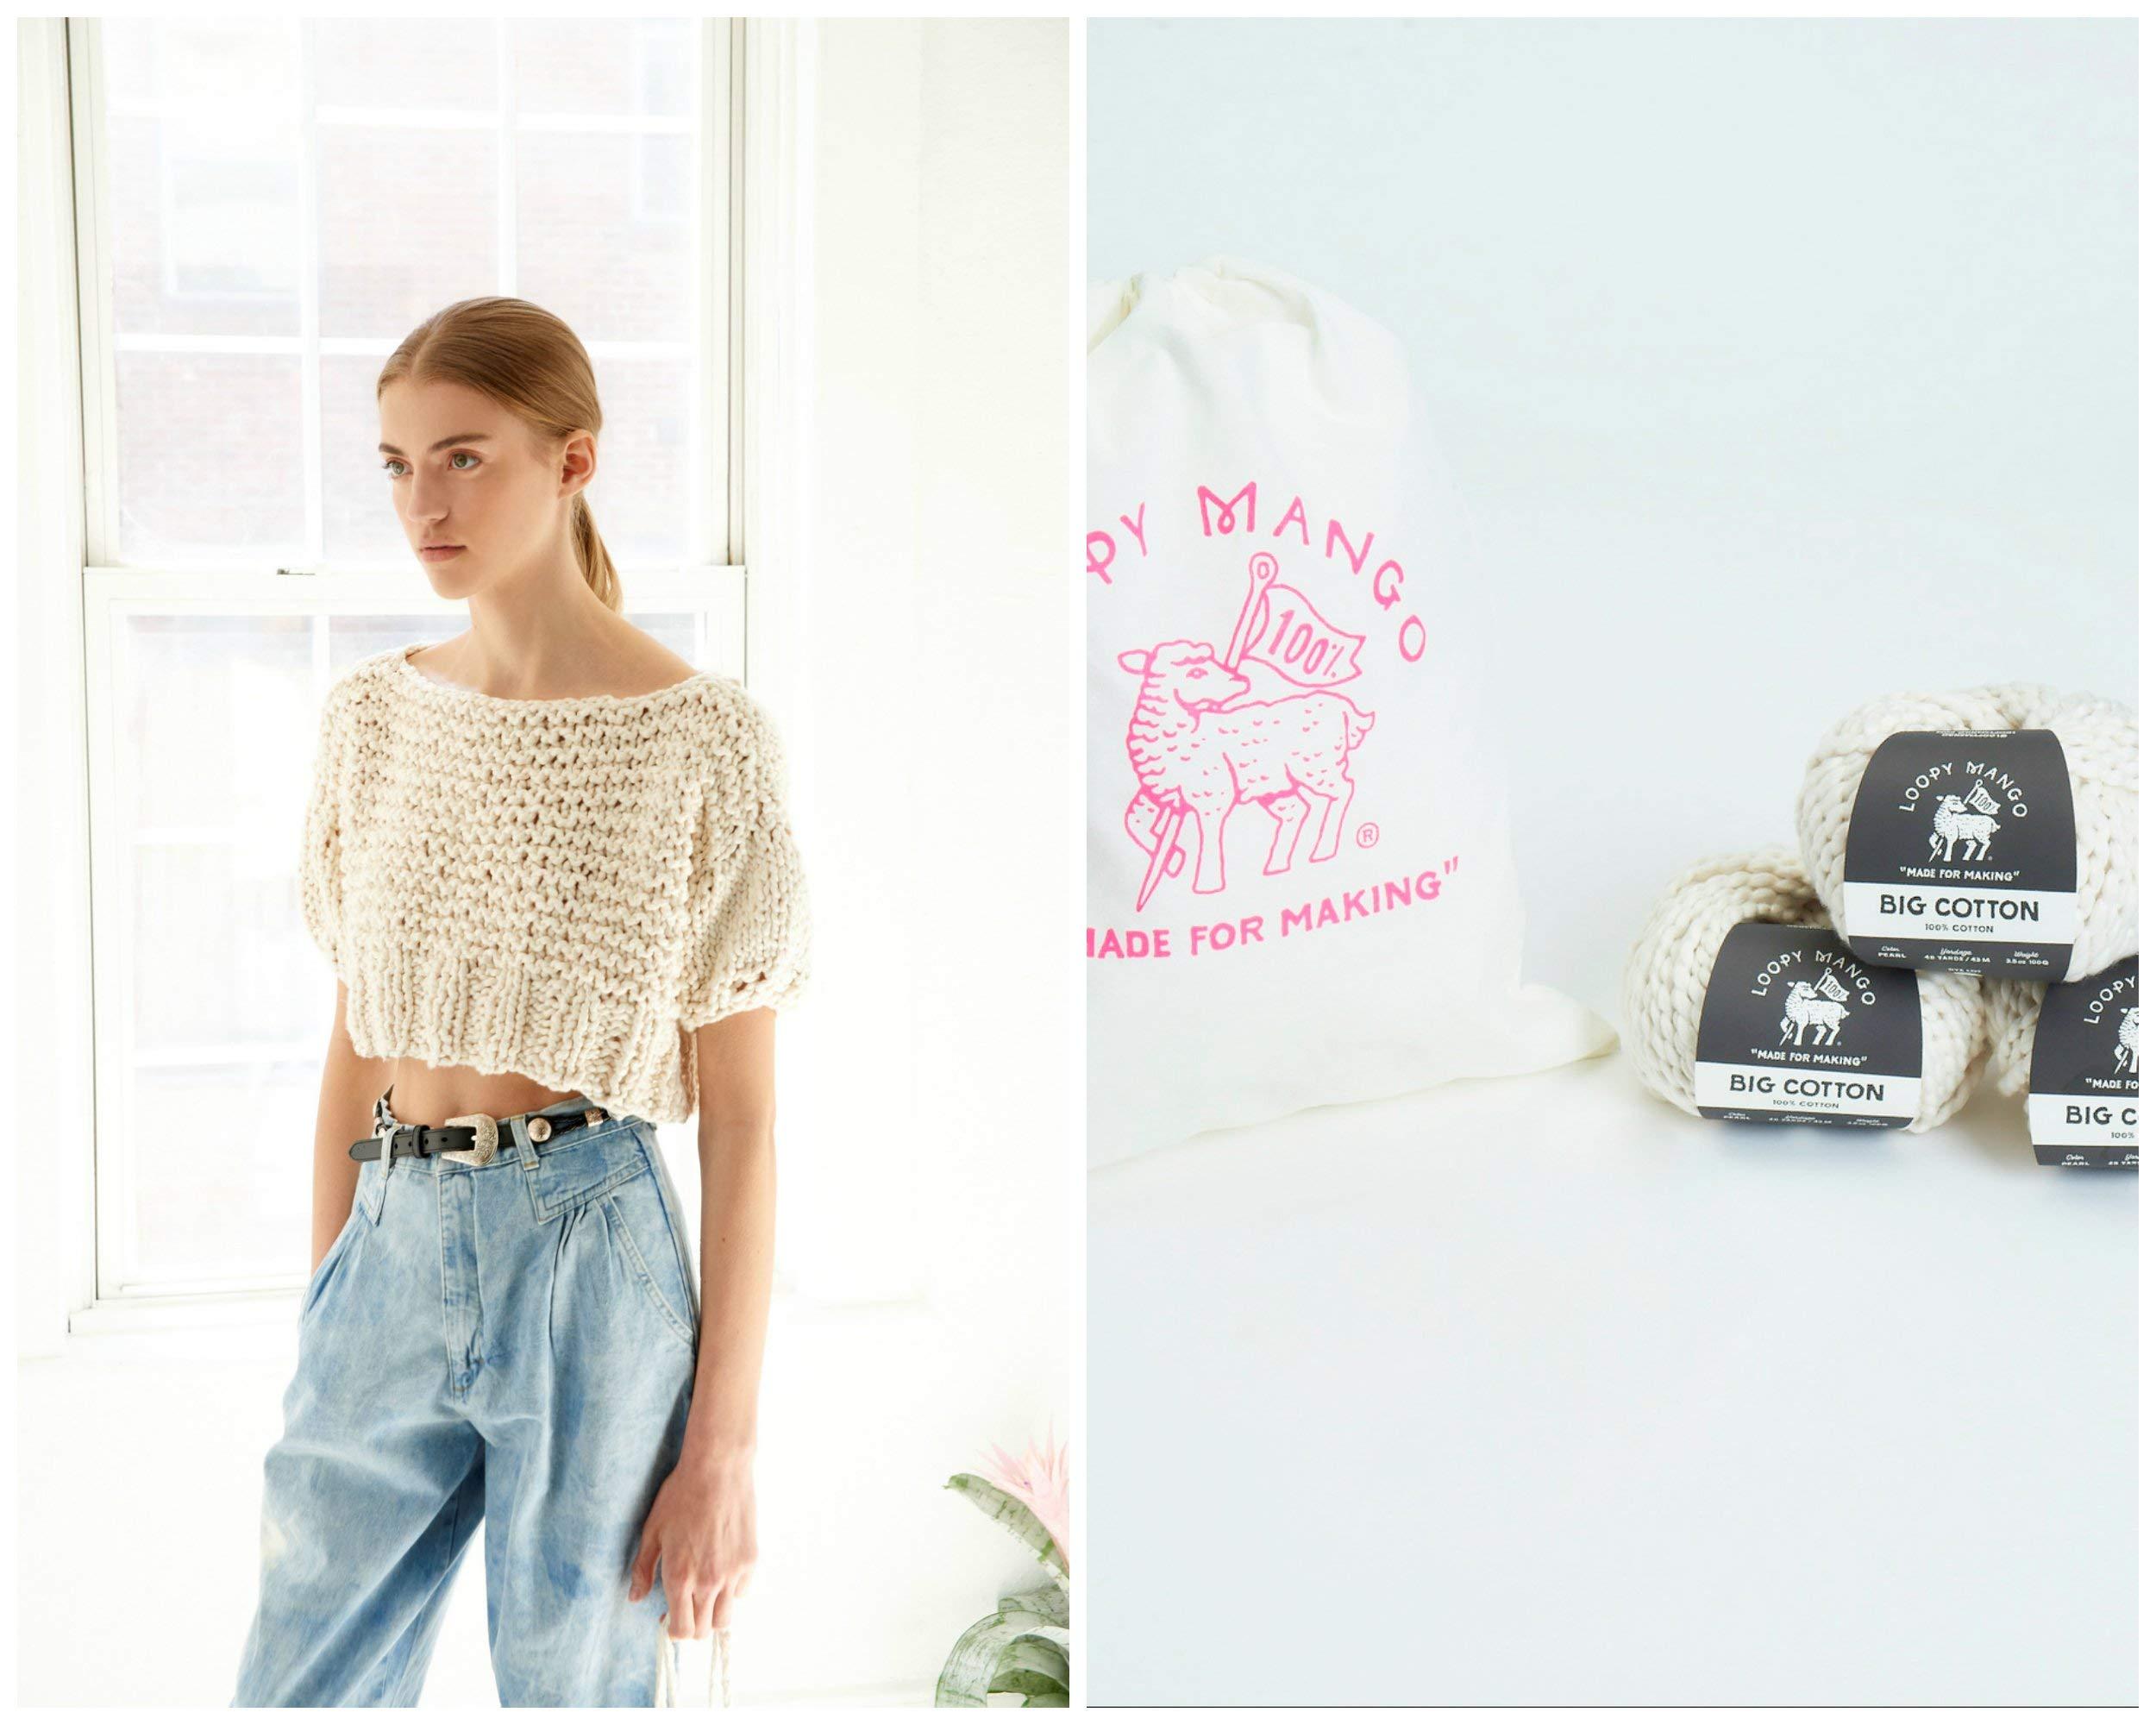 Loopy Mango DIY Knit Kit - Medium/Large Puff Sleeve Crop Top - Big Cotton (Emerald) by Loopy Mango (Image #1)